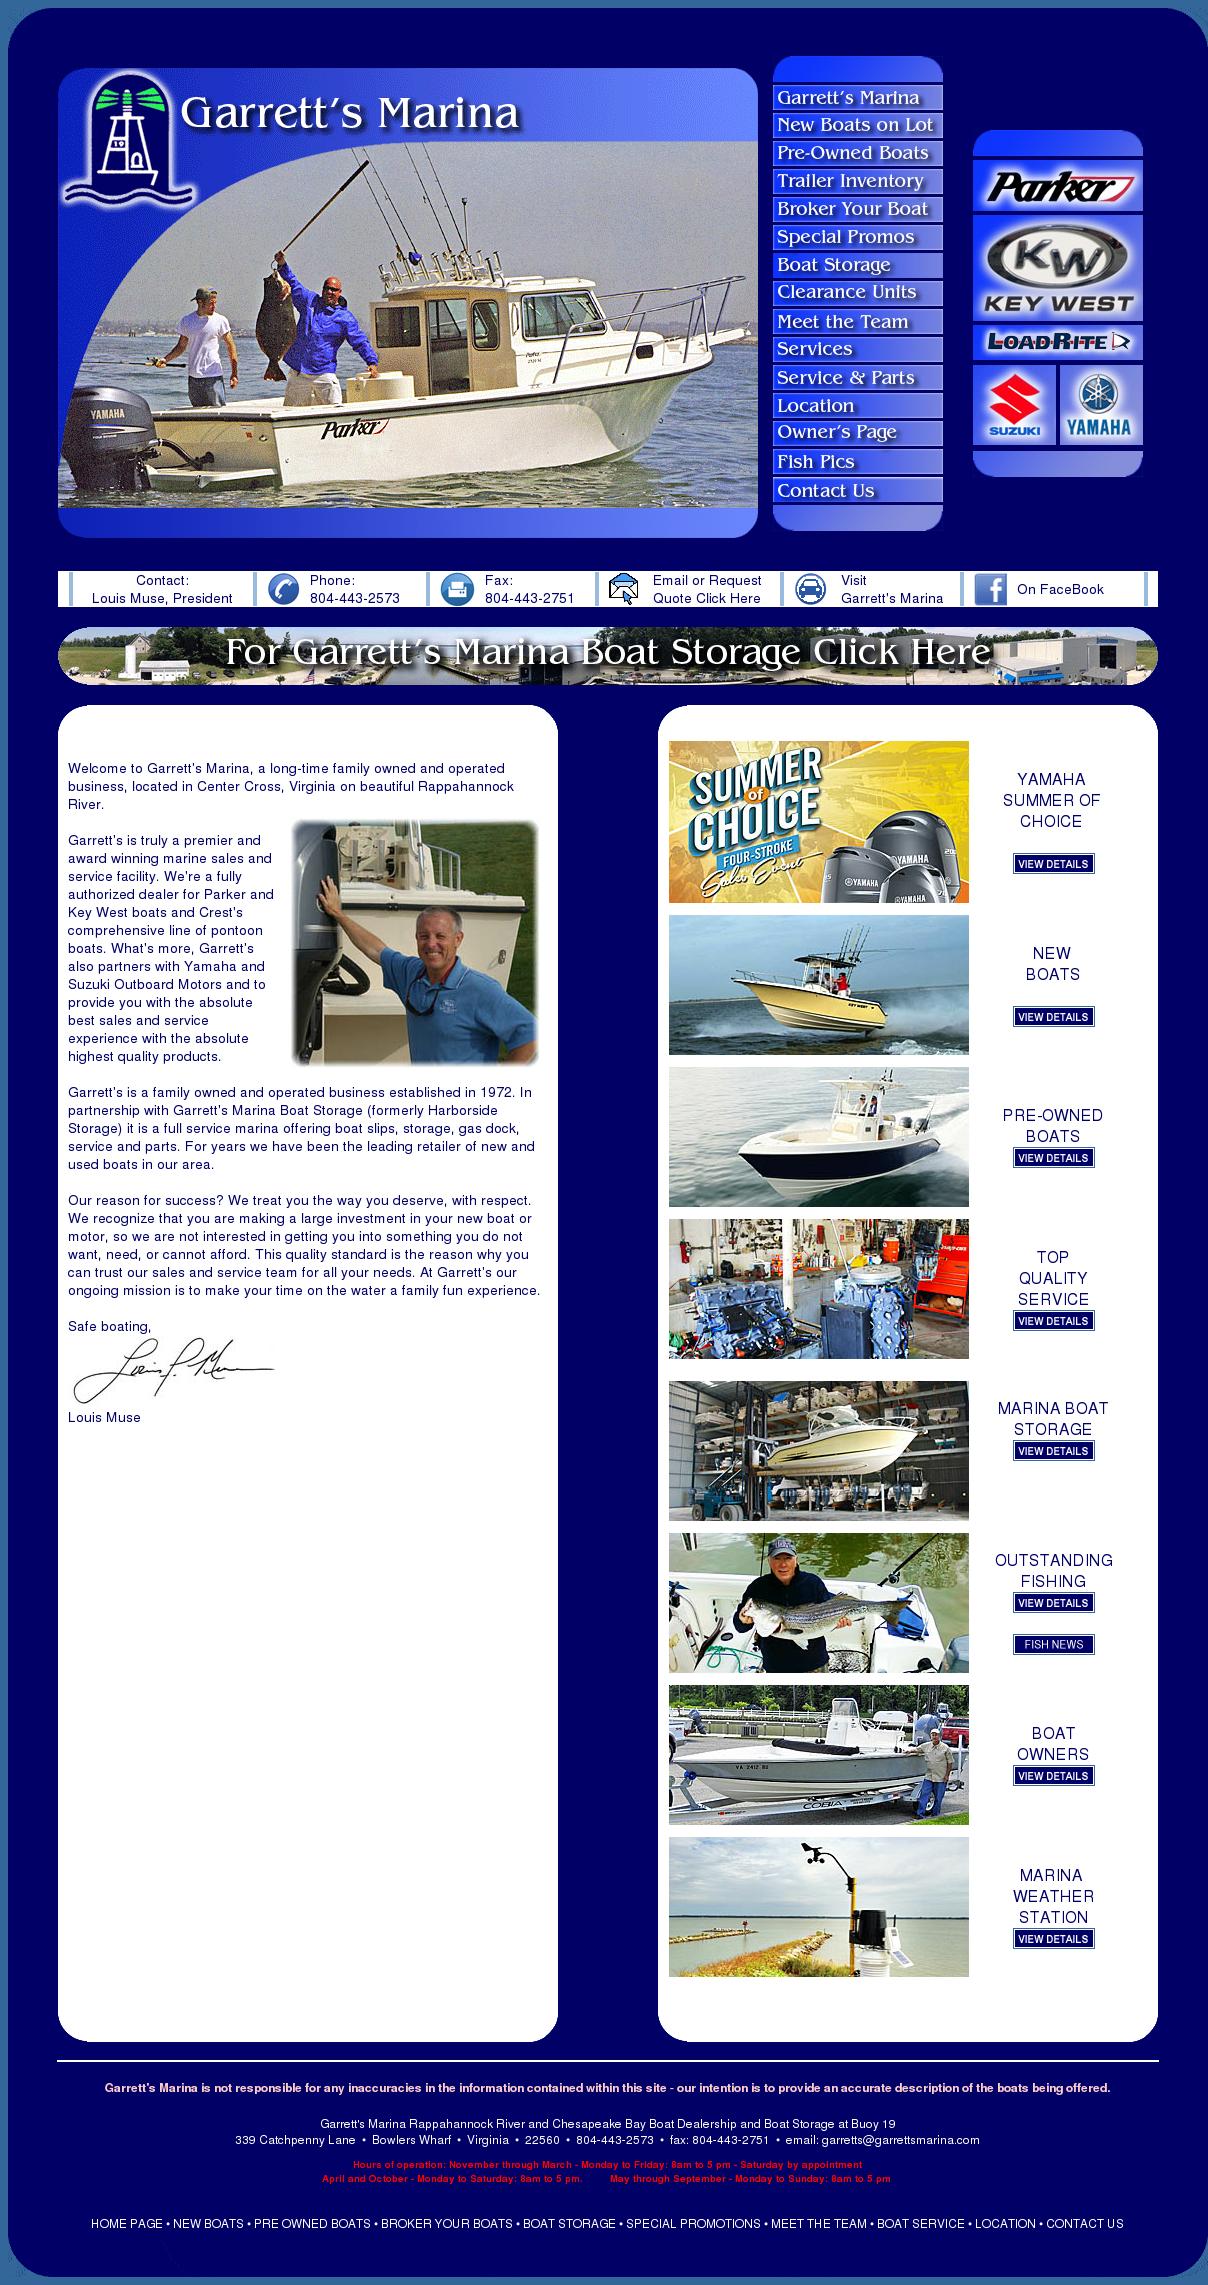 Garrett'S Marina Competitors, Revenue and Employees - Owler